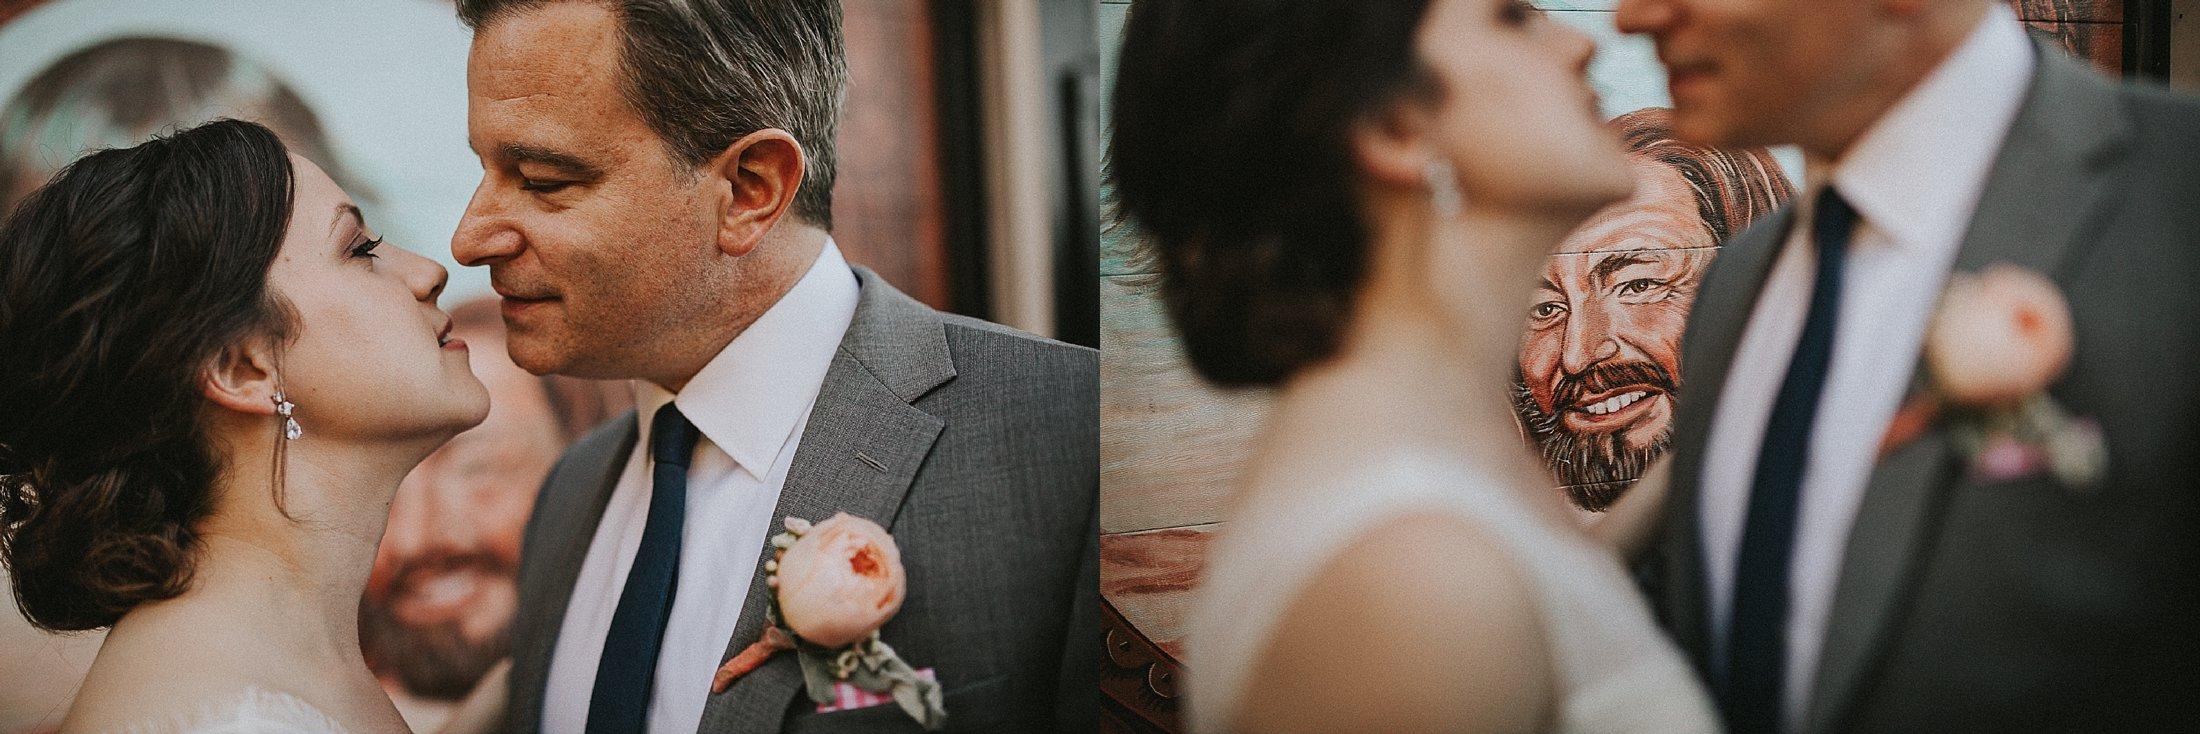 wedding-photojournalists-nashville-tn-30.jpg